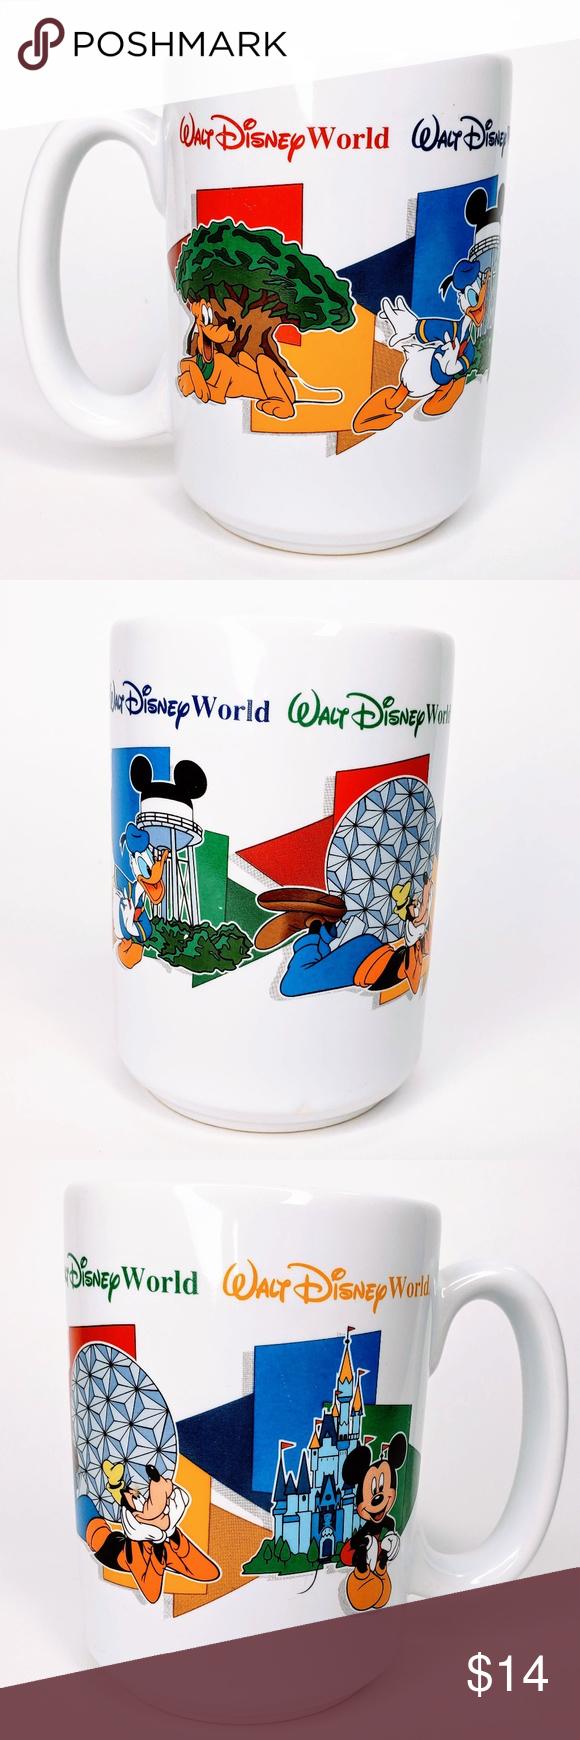 Walt Disney World Character Grandpa Coffee Mug Disney World Characters Disney World Walt Disney World